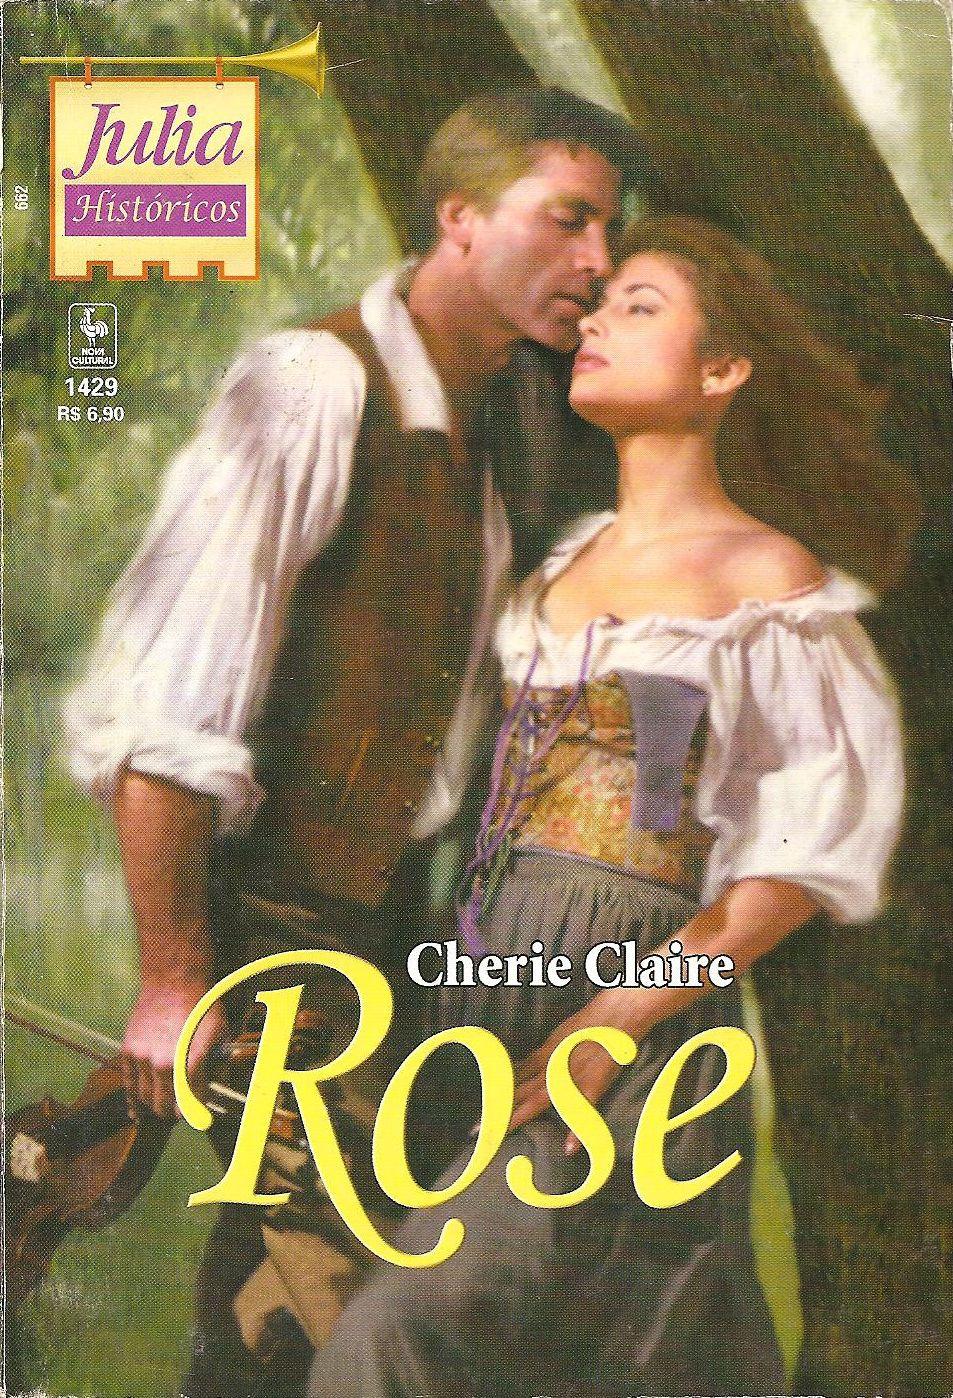 Cherie Claire